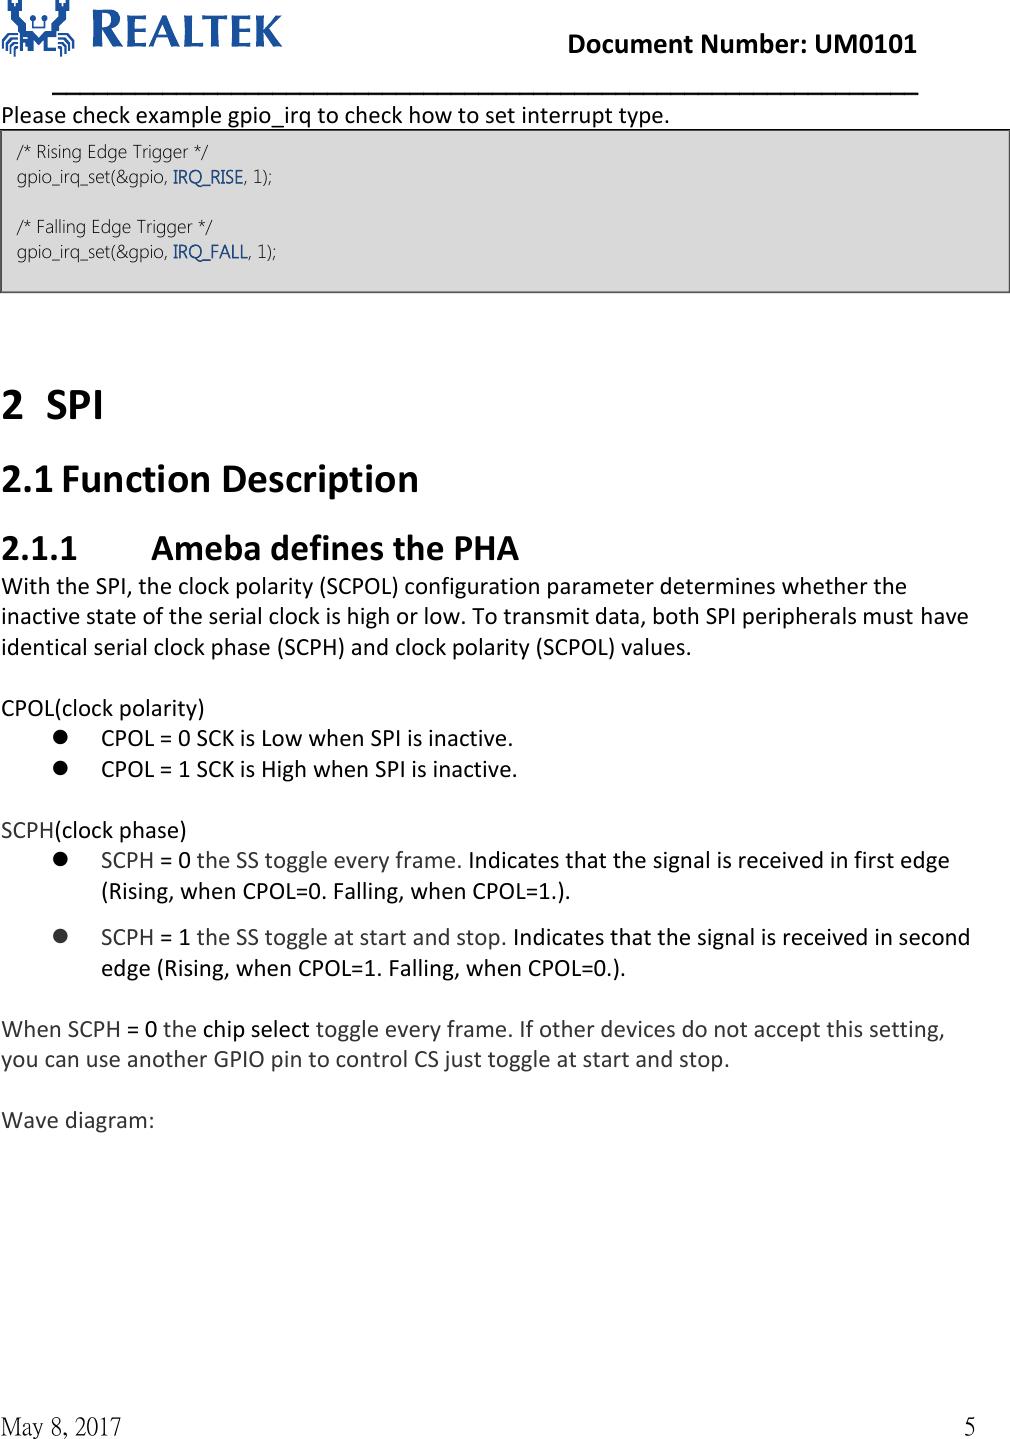 NFC Control UM0101 Realtek Ameba 1 Peripheral Developerment